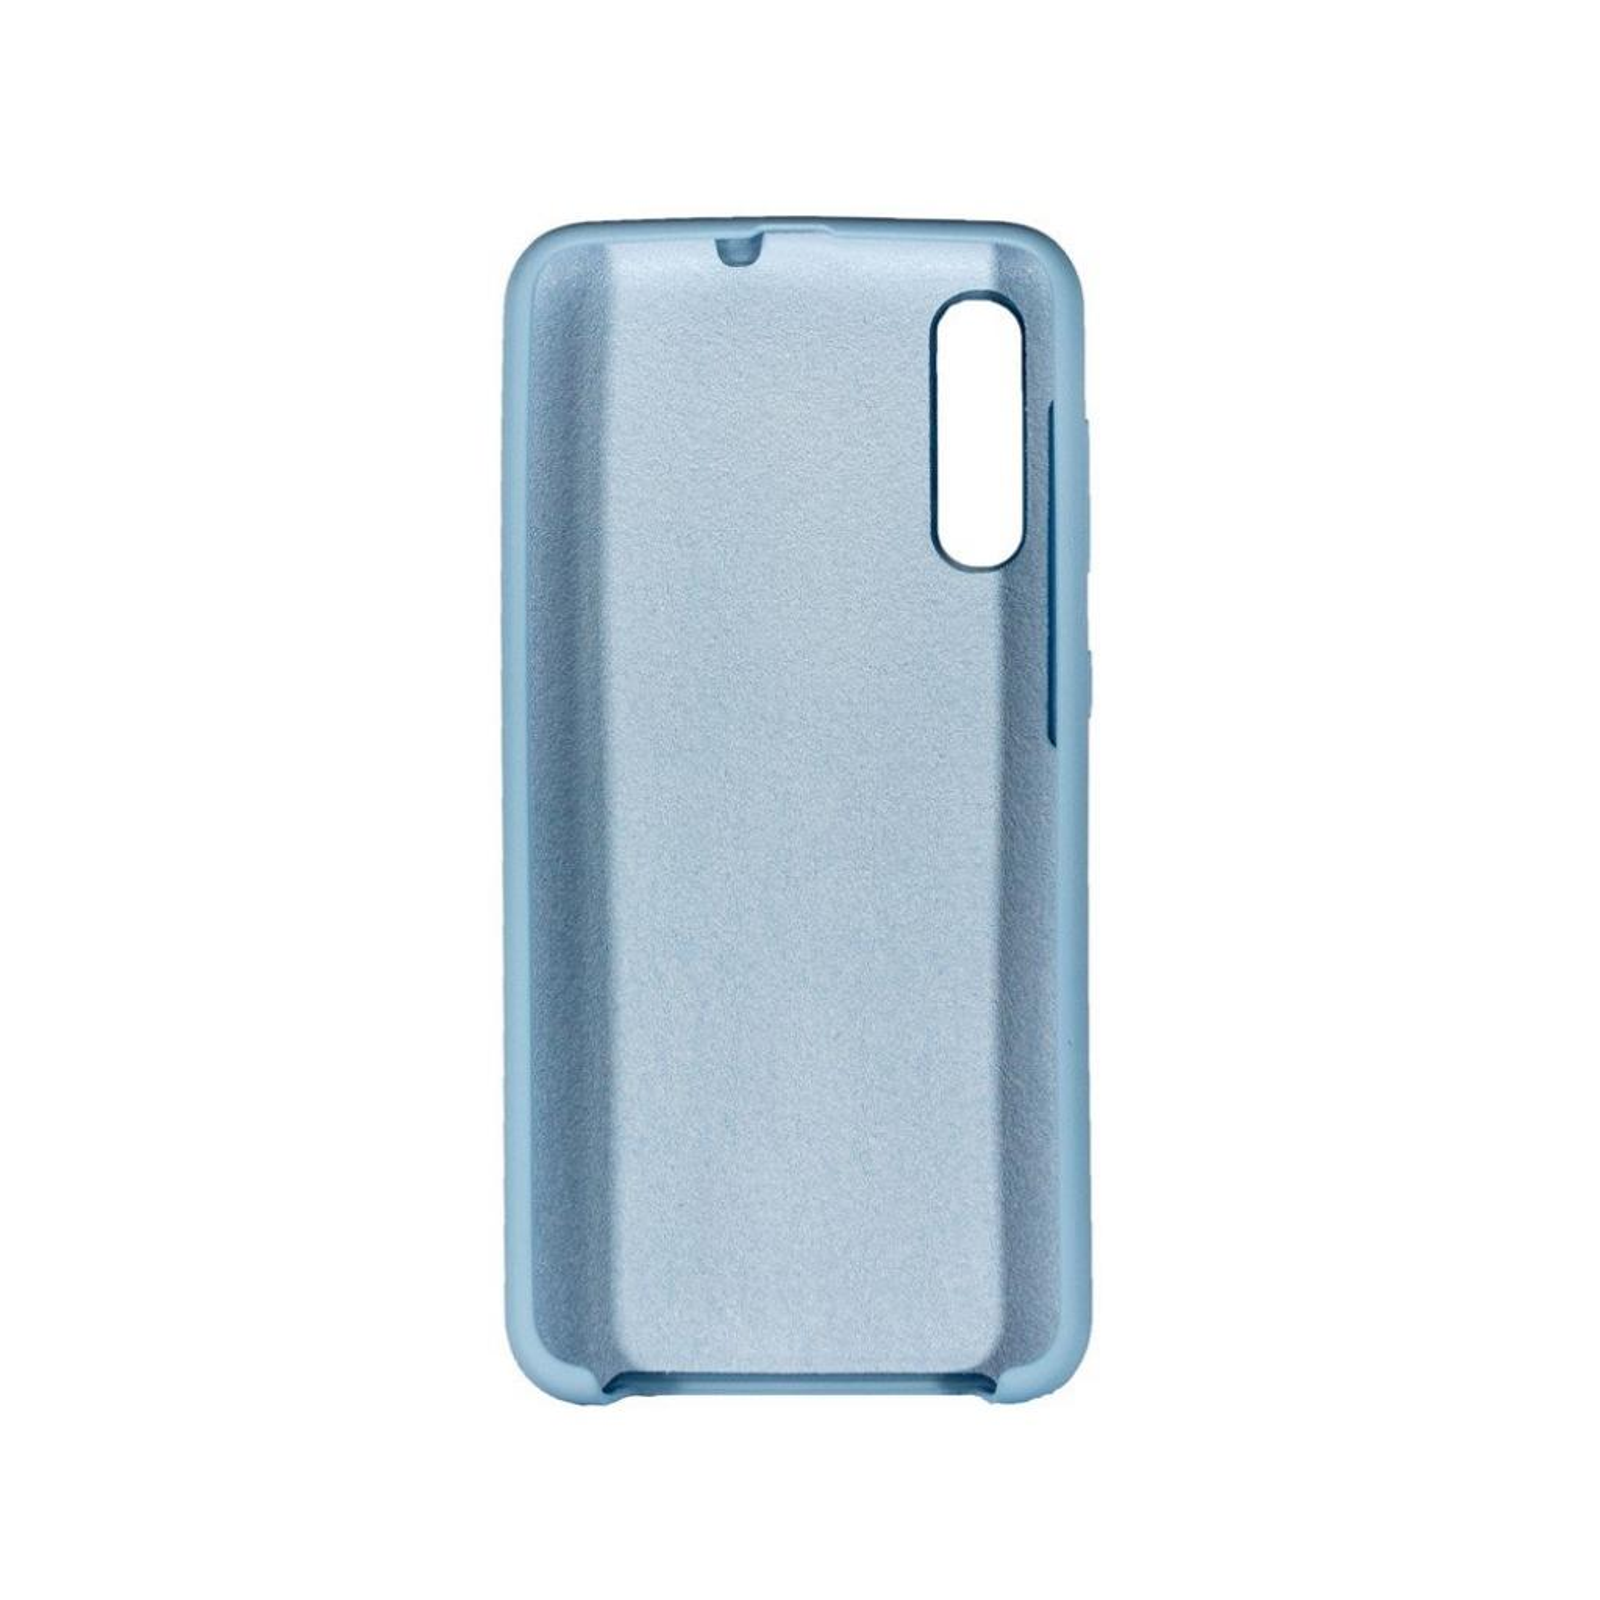 Чехол для моб. телефона ColorWay ColorWay Liquid Silicone для Samsung Galaxy A50 Yellow (CW-CLSSGA505-YL) изображение 2